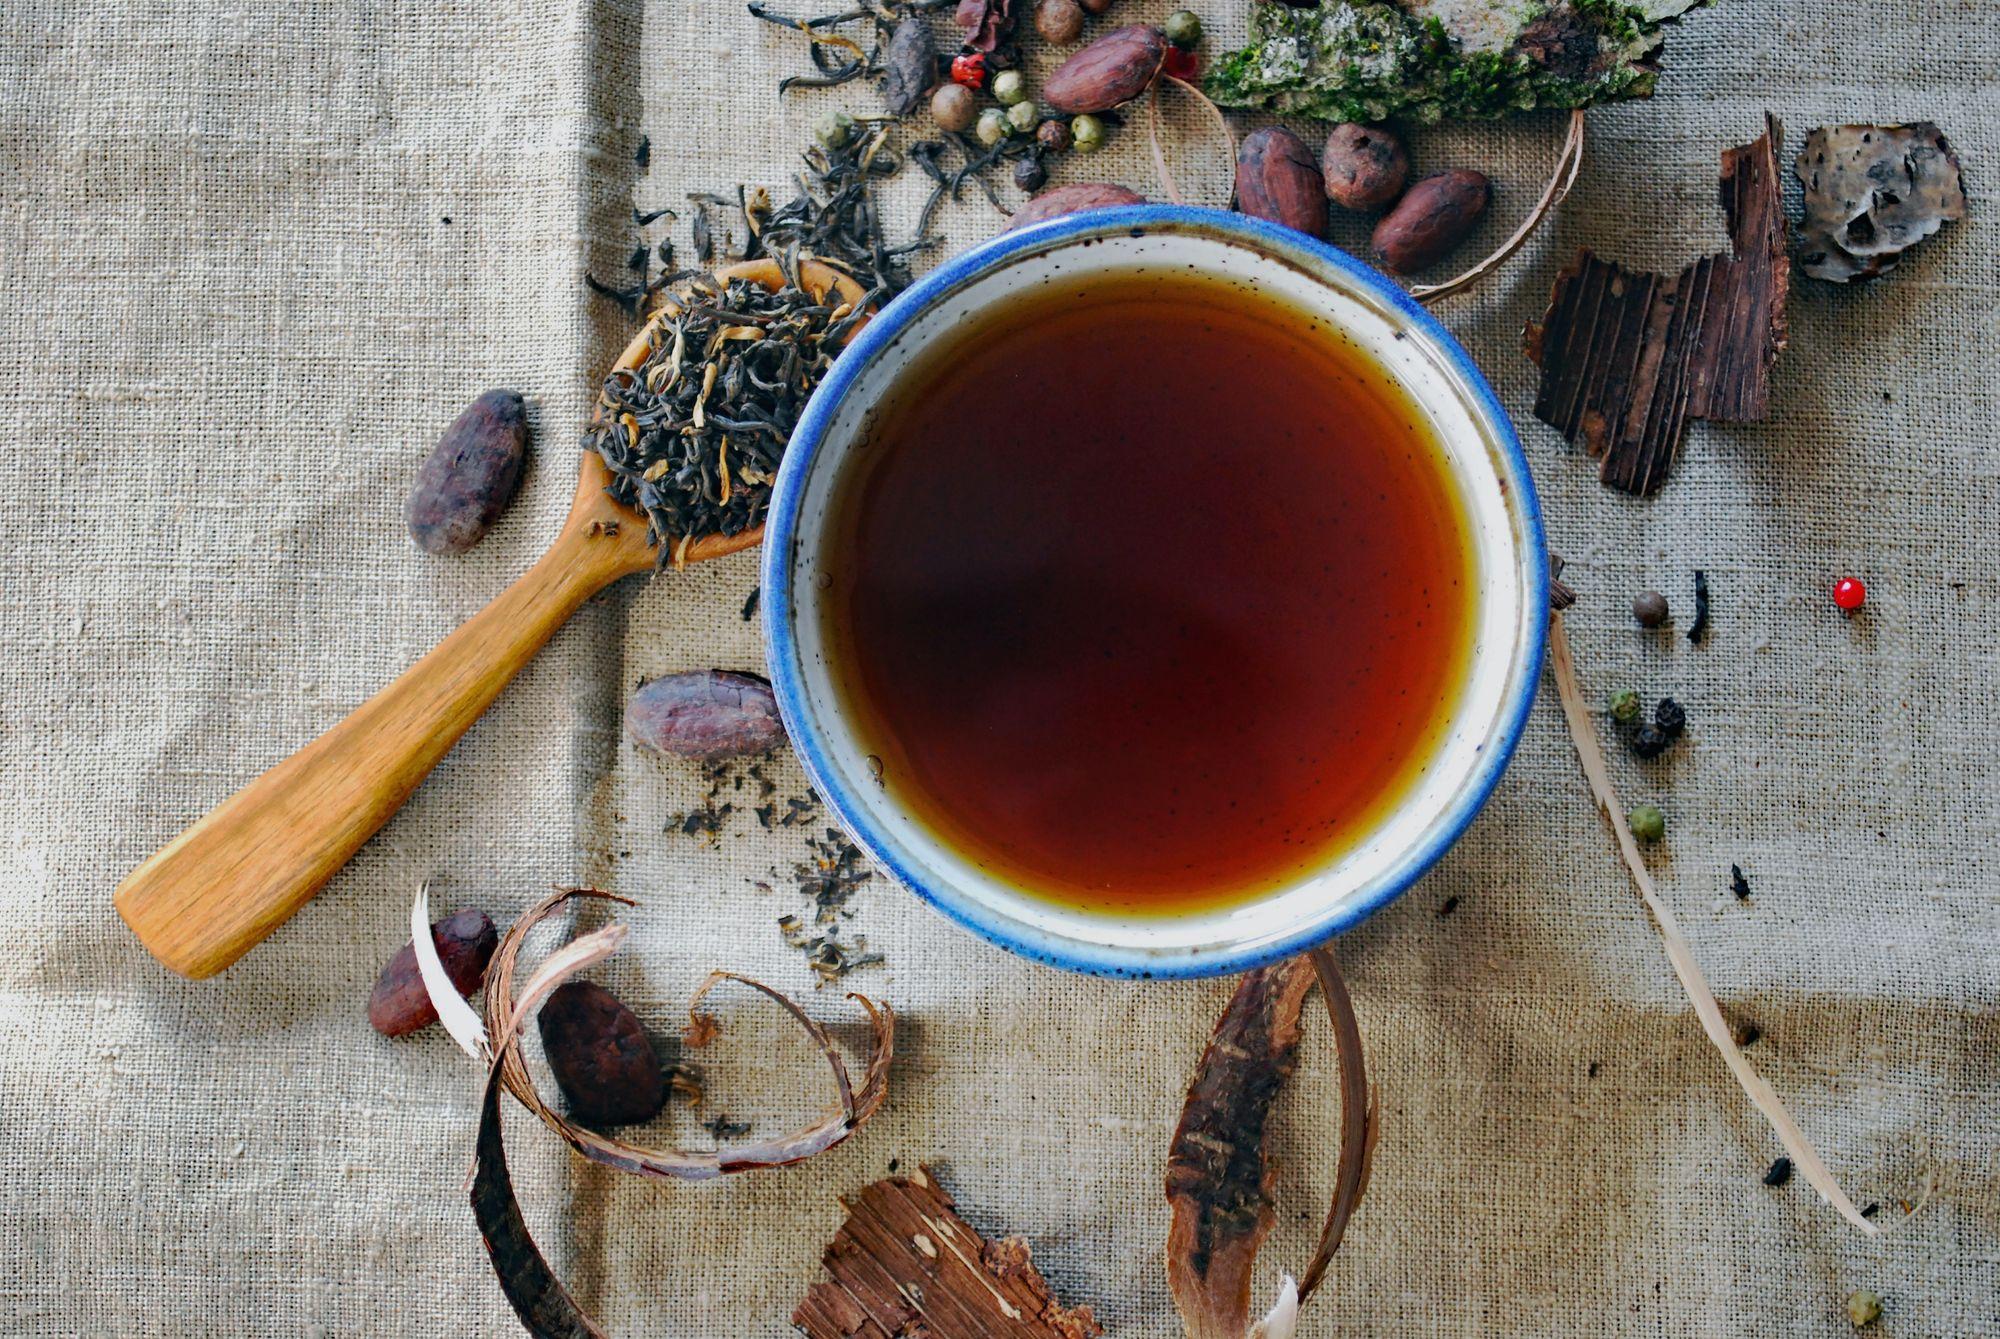 From tea bar to tea subscription with Plentea